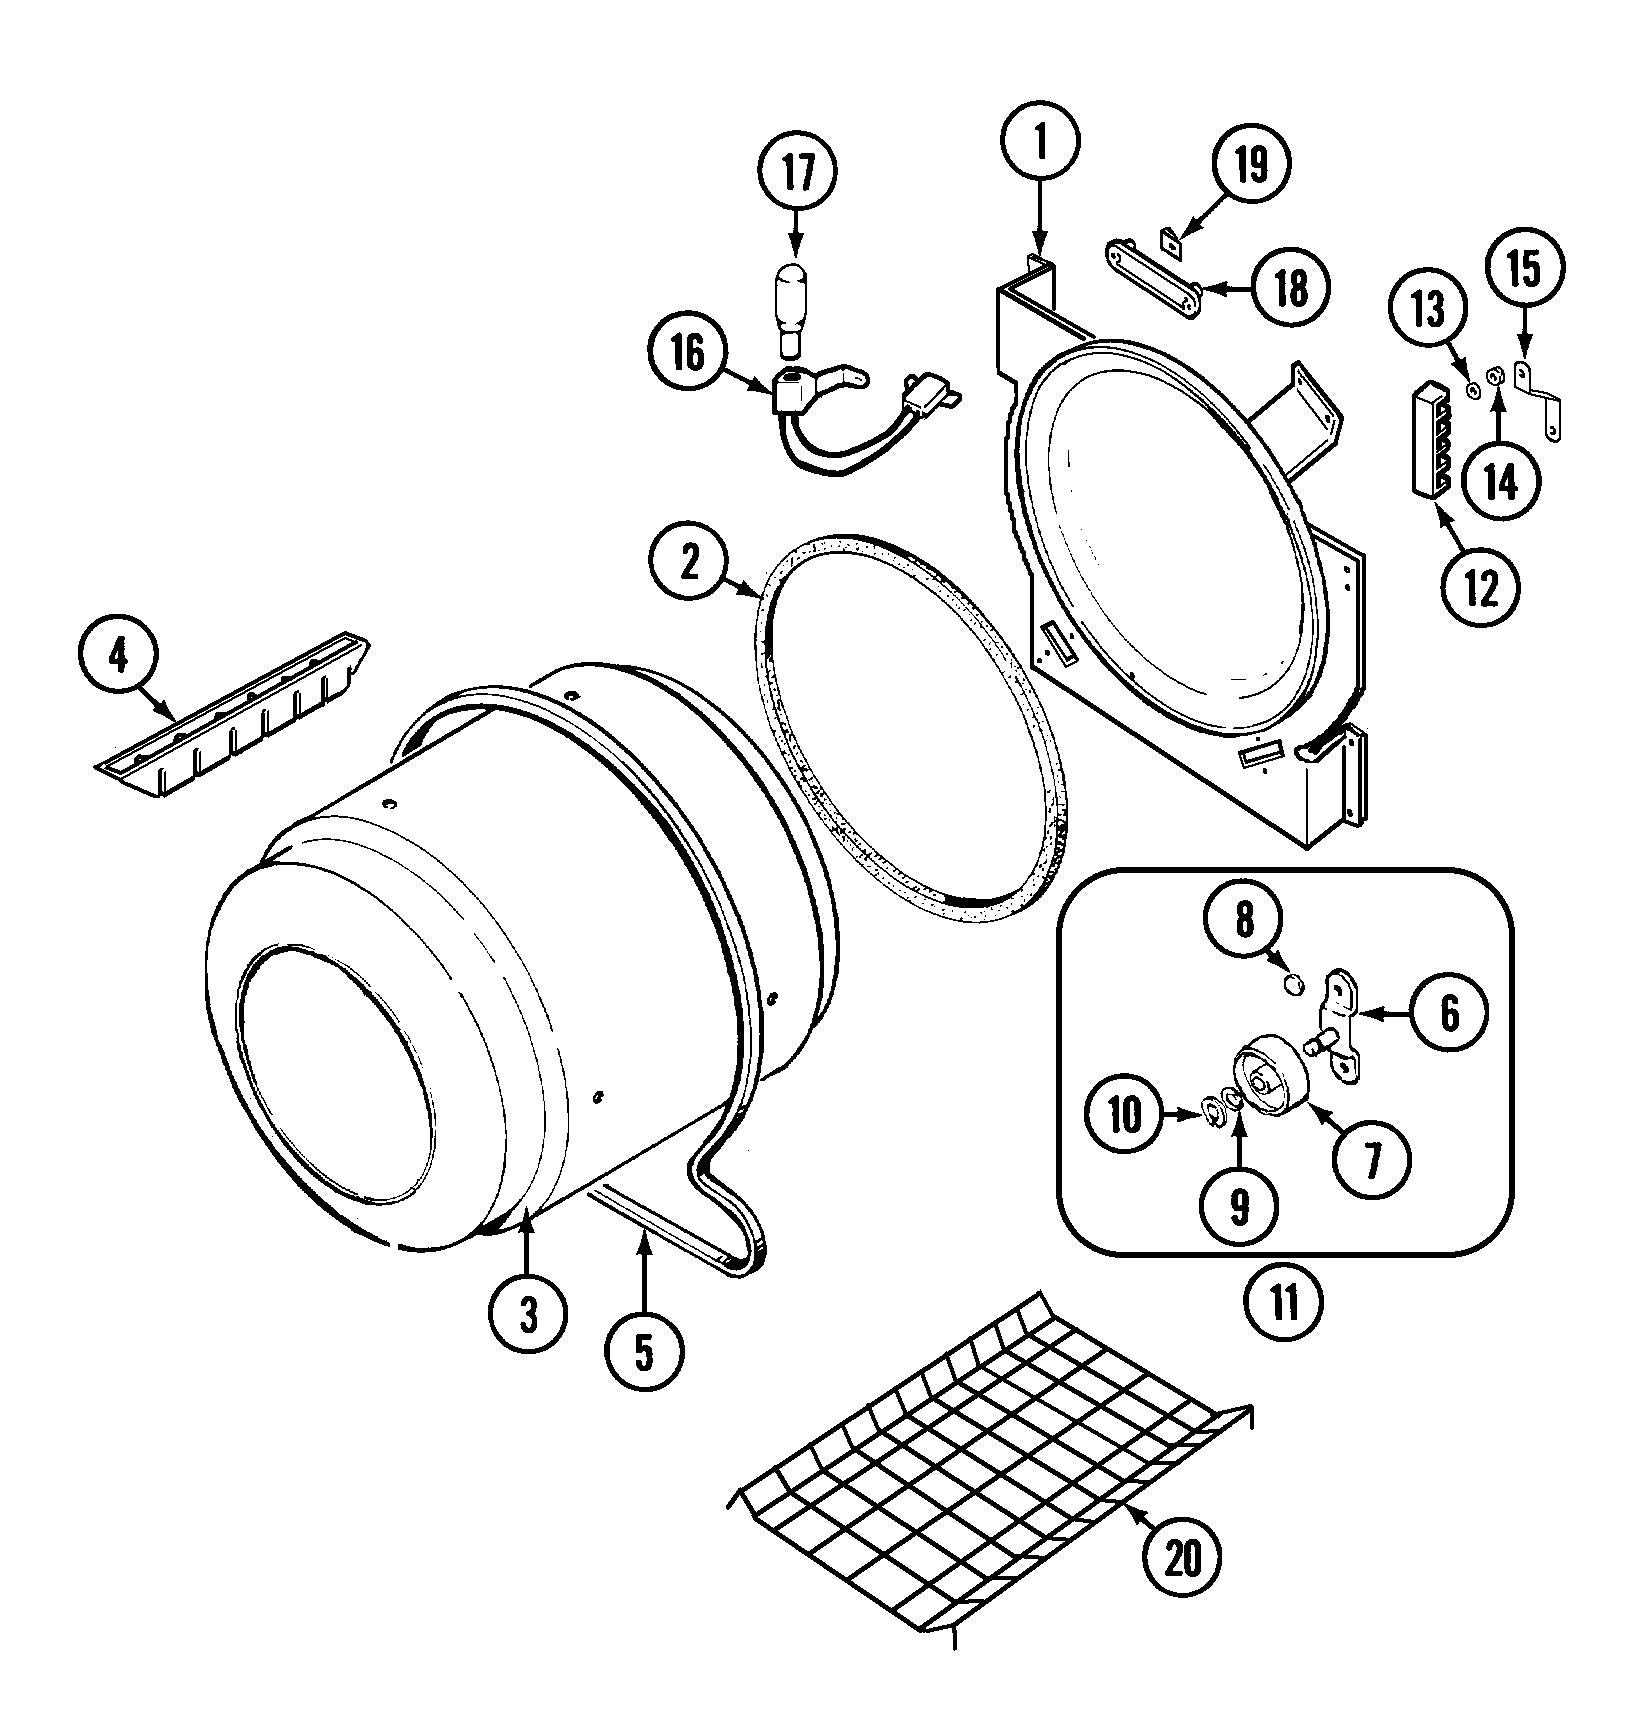 crosley dryer parts diagram on wiring diagram for crosley dryer